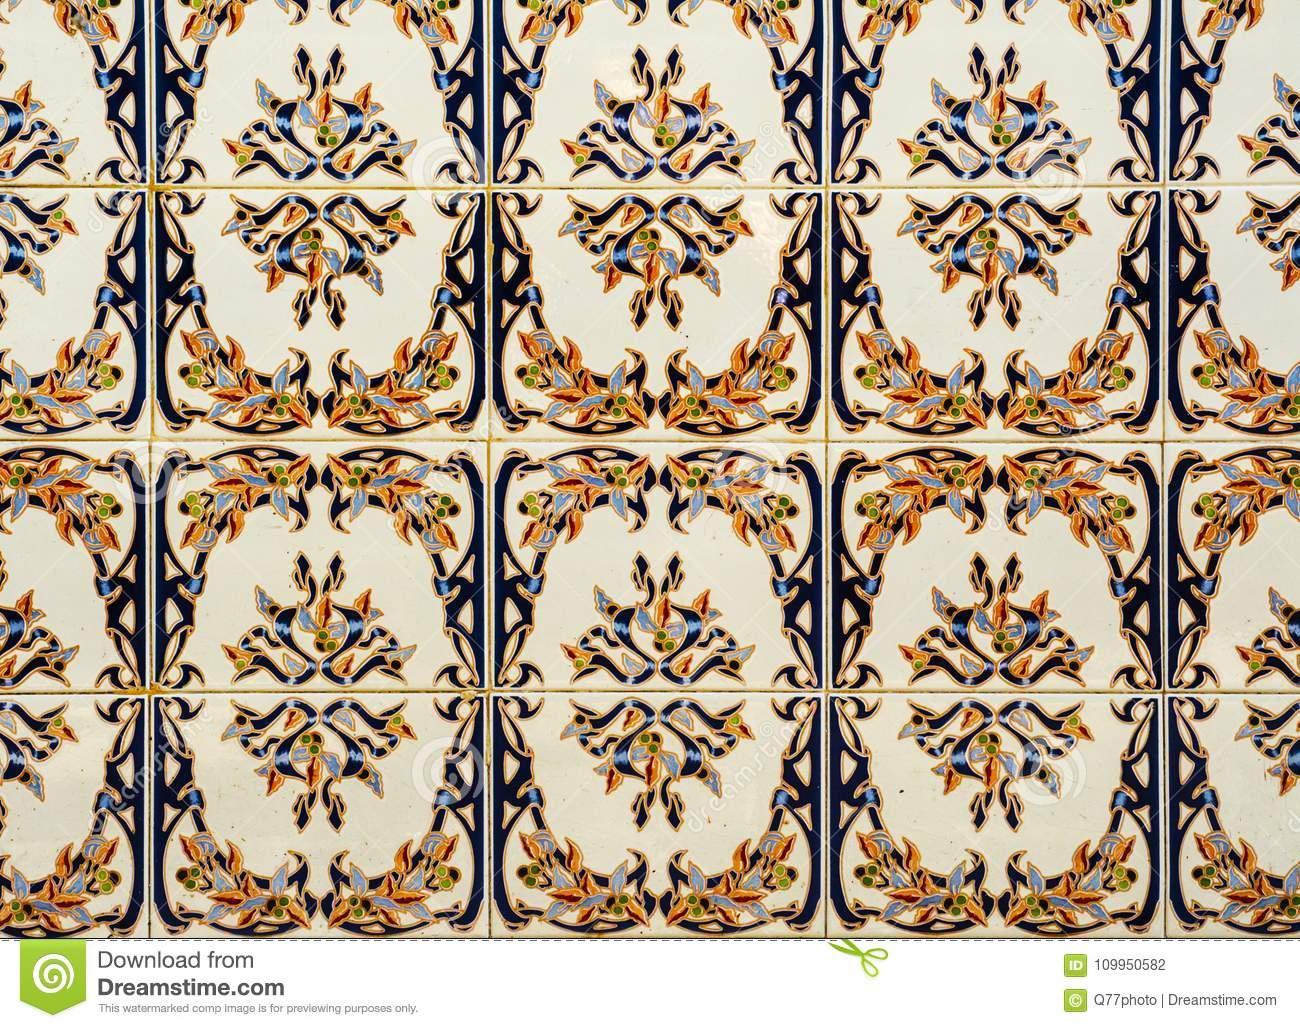 Newest Traditional Ornamental Spanish Decorative Tiles, Original Ceramic Throughout Spanish Ornamental Wall Decor (Gallery 9 of 20)